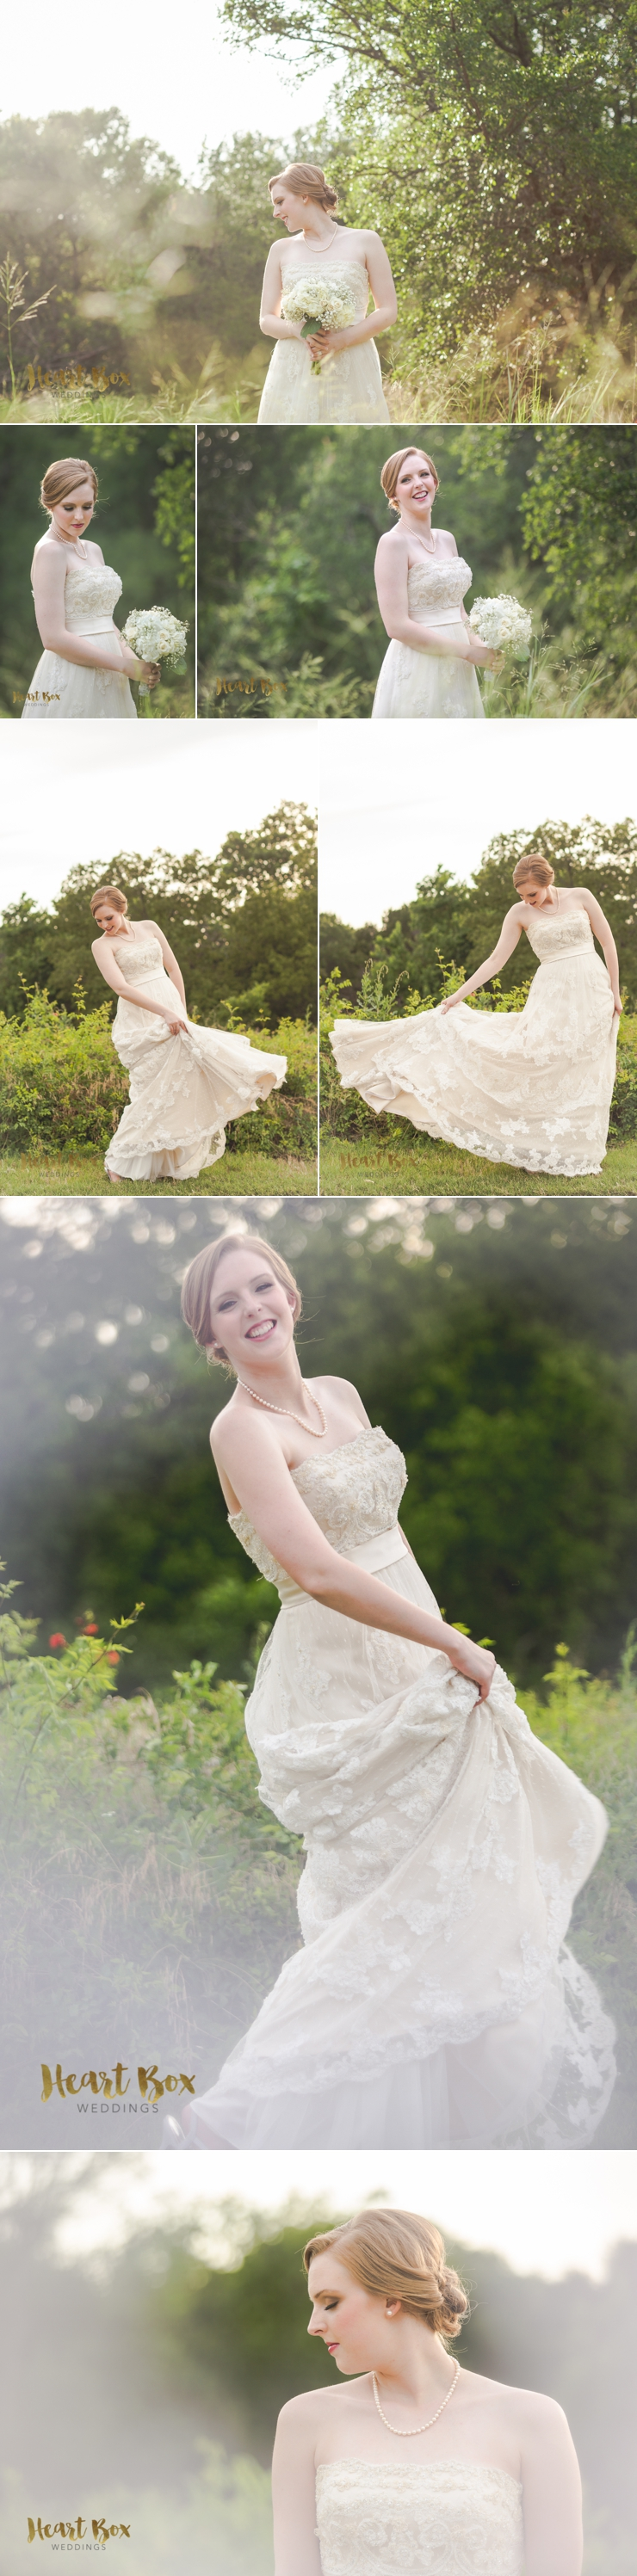 Kaylin Bridal Blog Collages 4.jpg